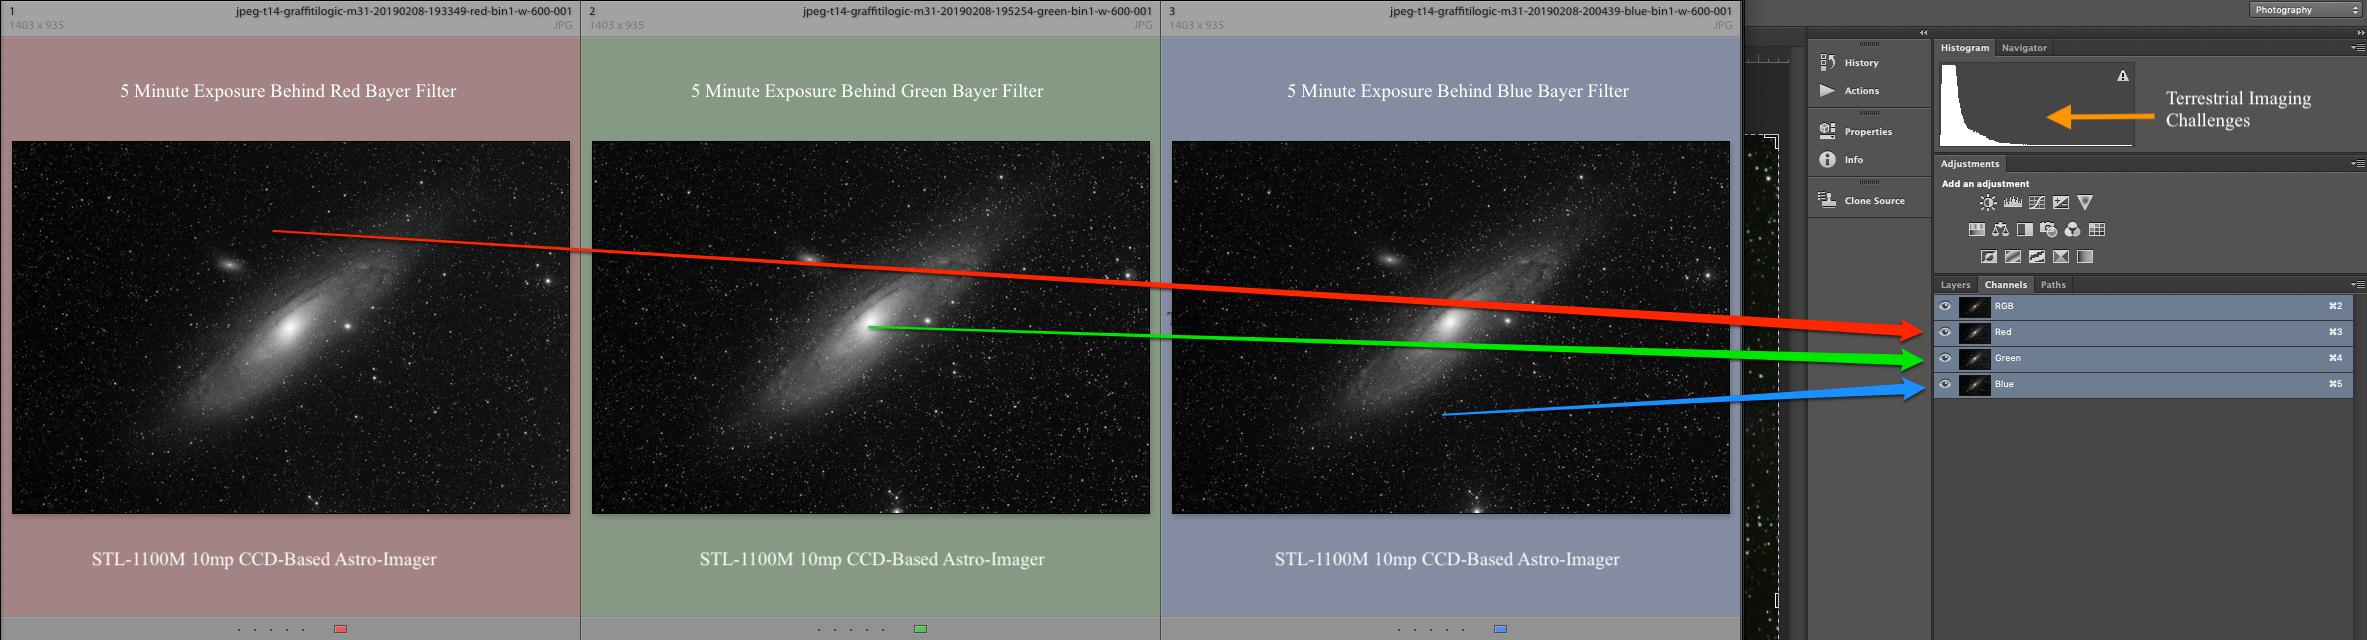 M31-ProcessingFrame.jpg